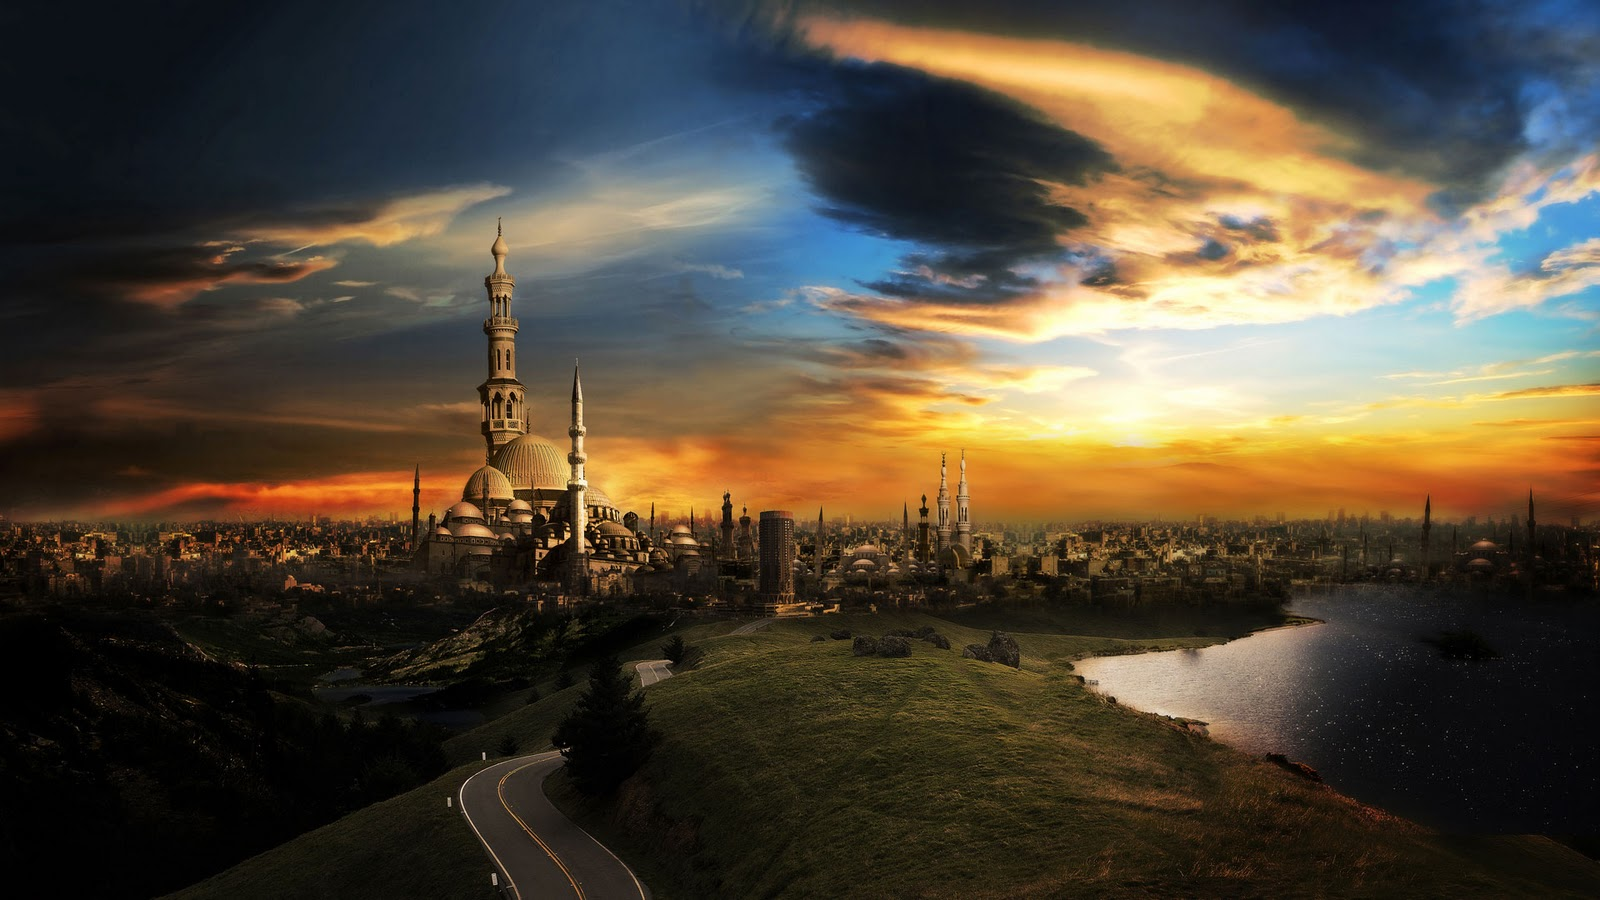 city Sunset high definition